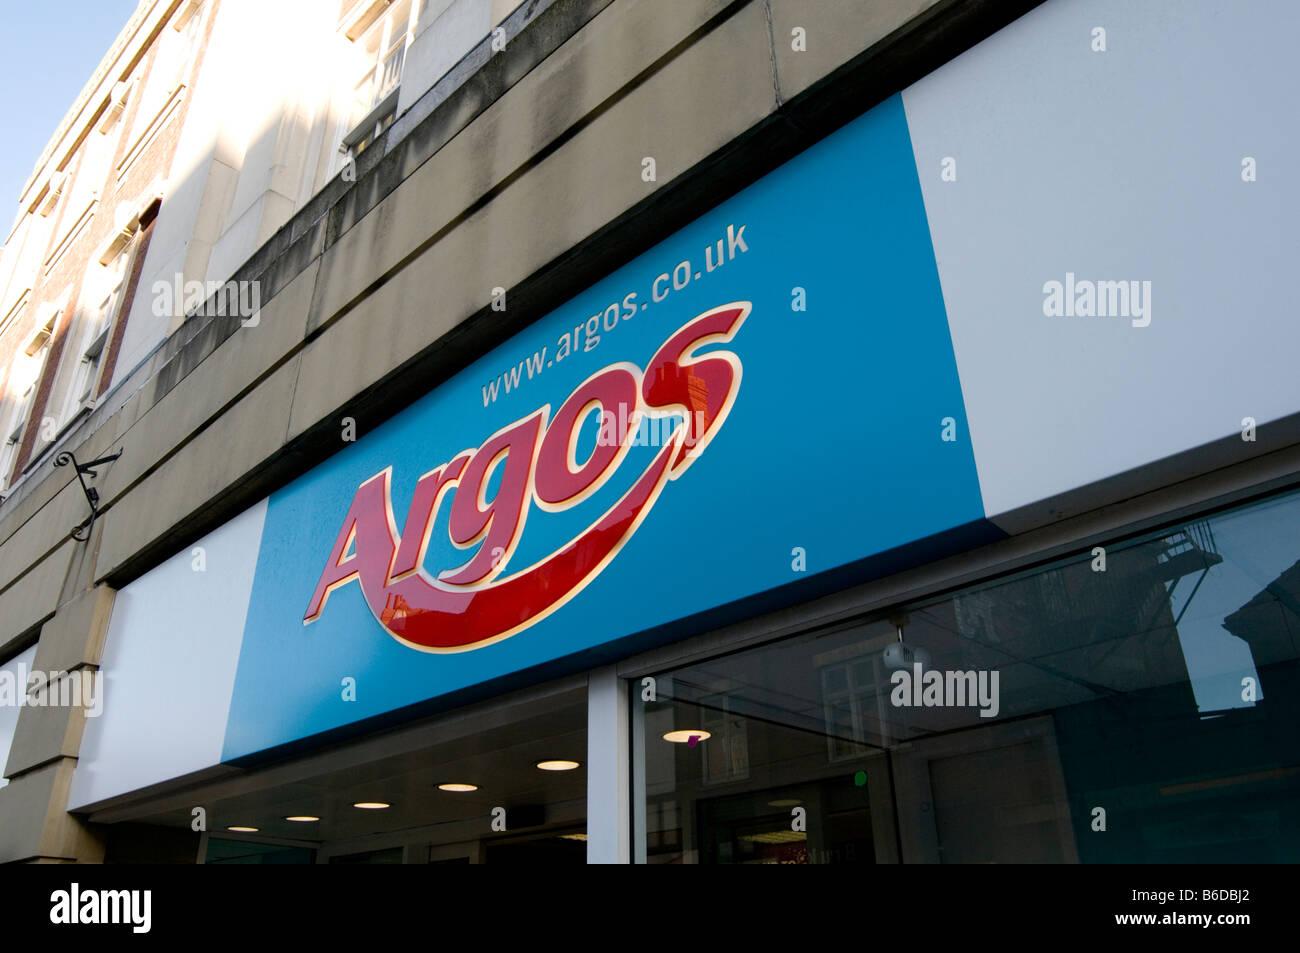 argos catalogue retailer shop retailing high street highstreet retail shopping brand logo branding - Stock Image